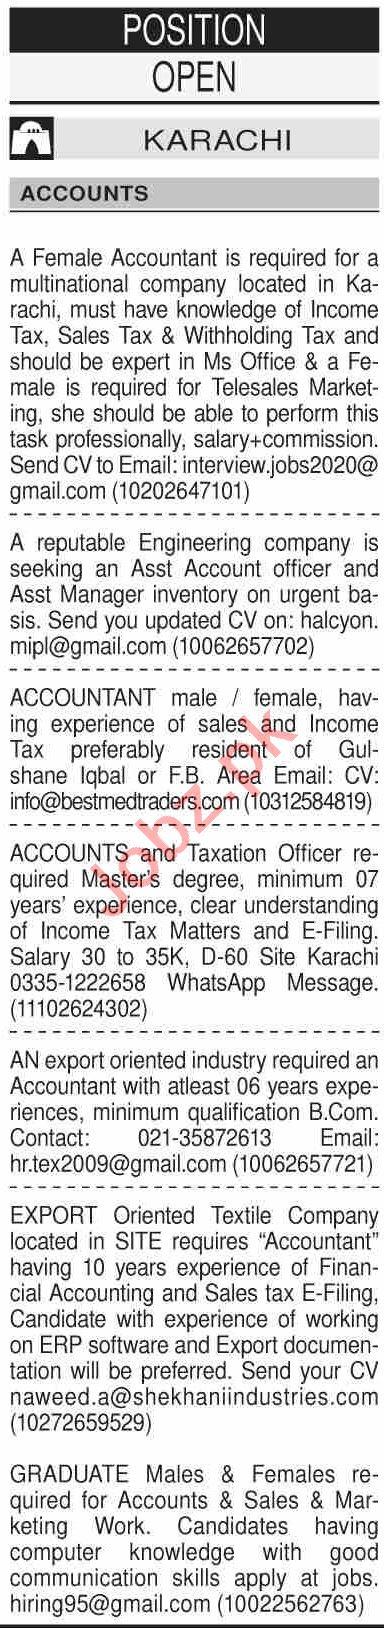 Dawn Sunday Classified Ads 6 Dec 2020 for Accounts Staff